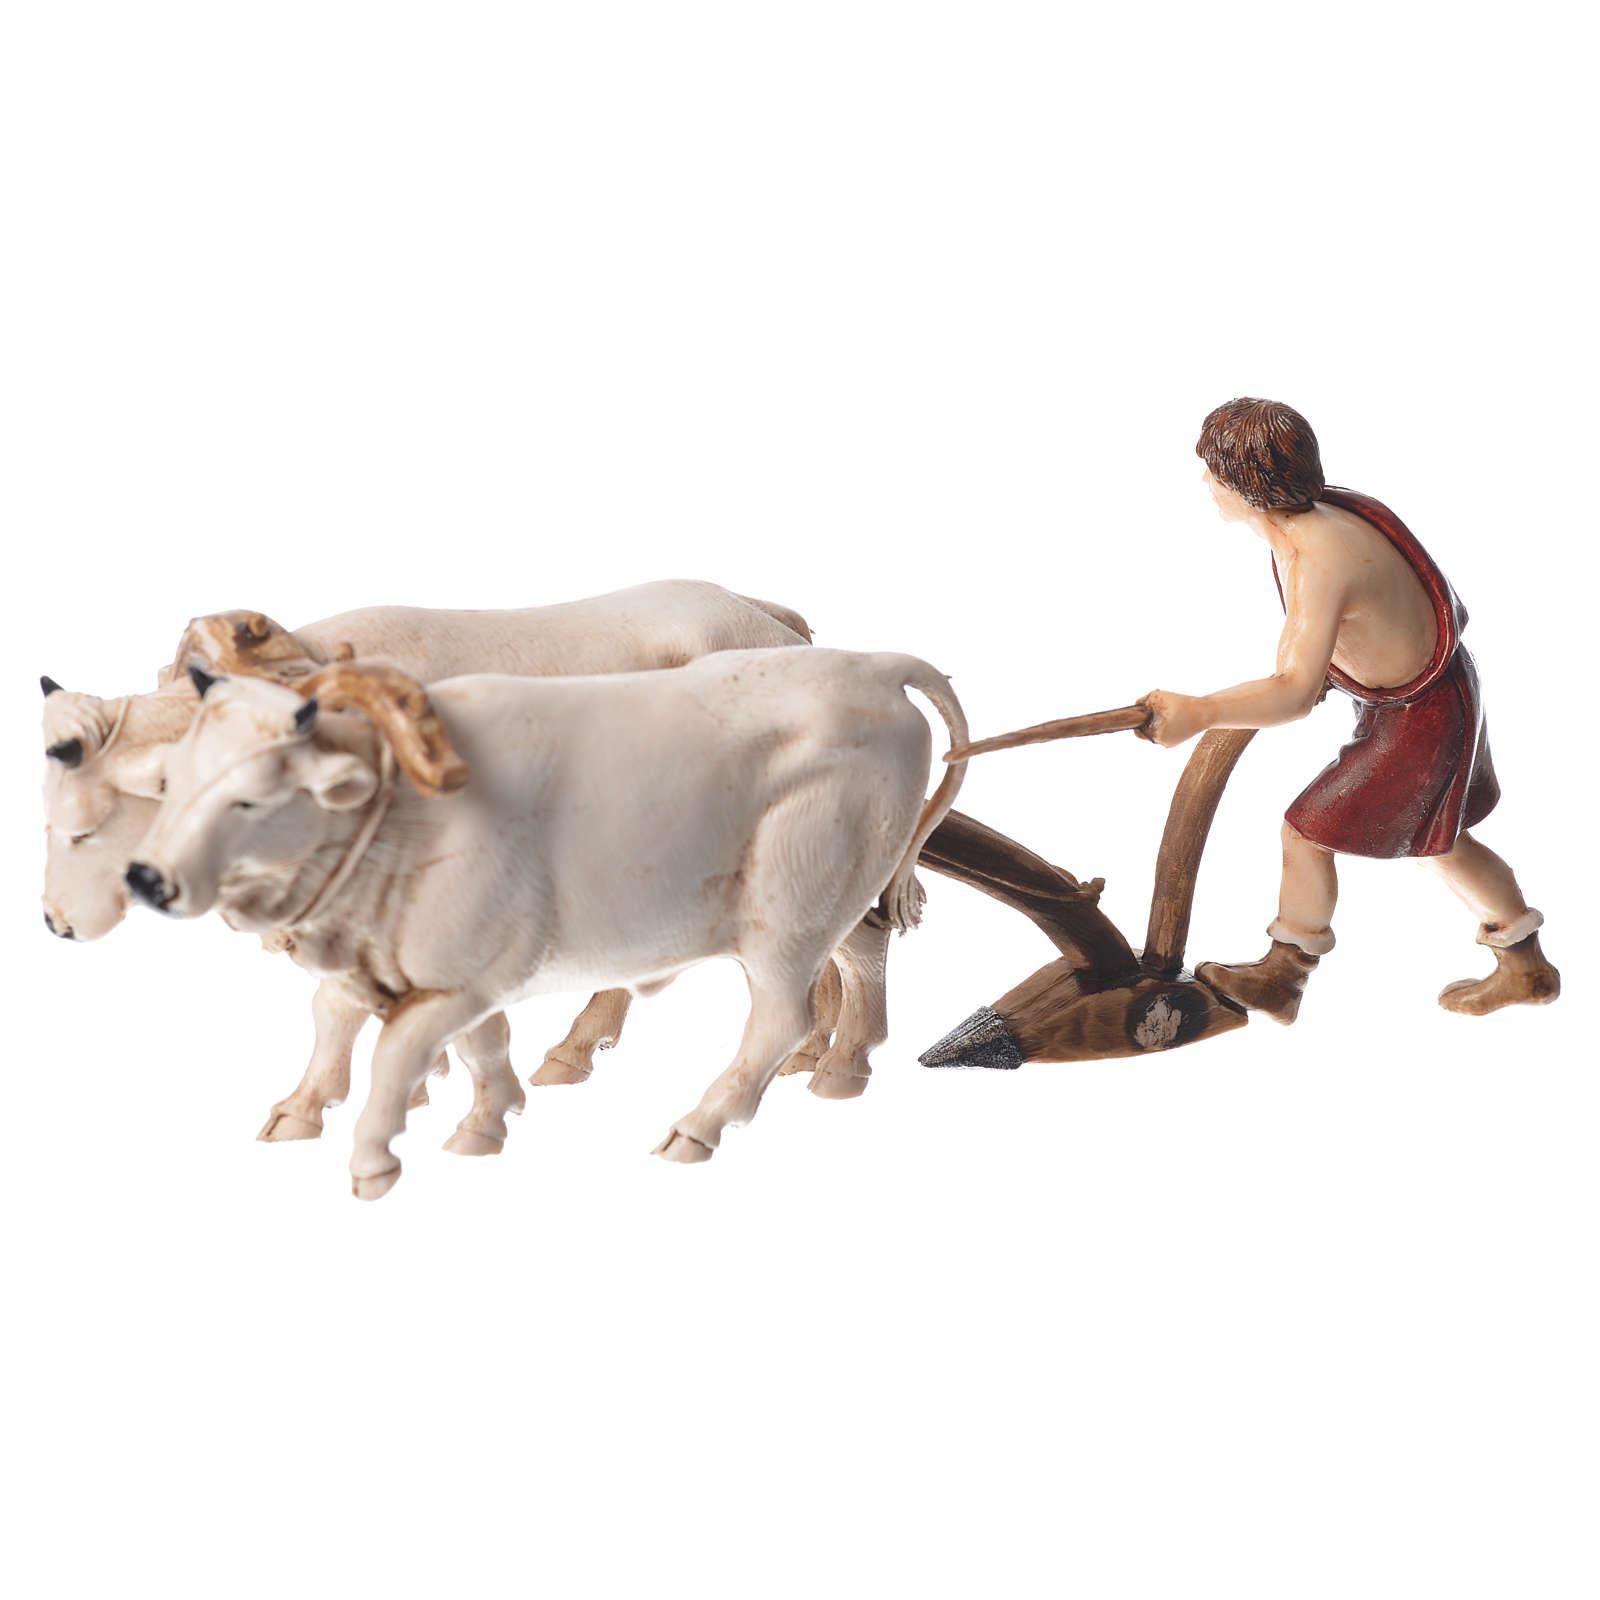 Group with plough, nativity figurines, 10cm Moranduzzo 4